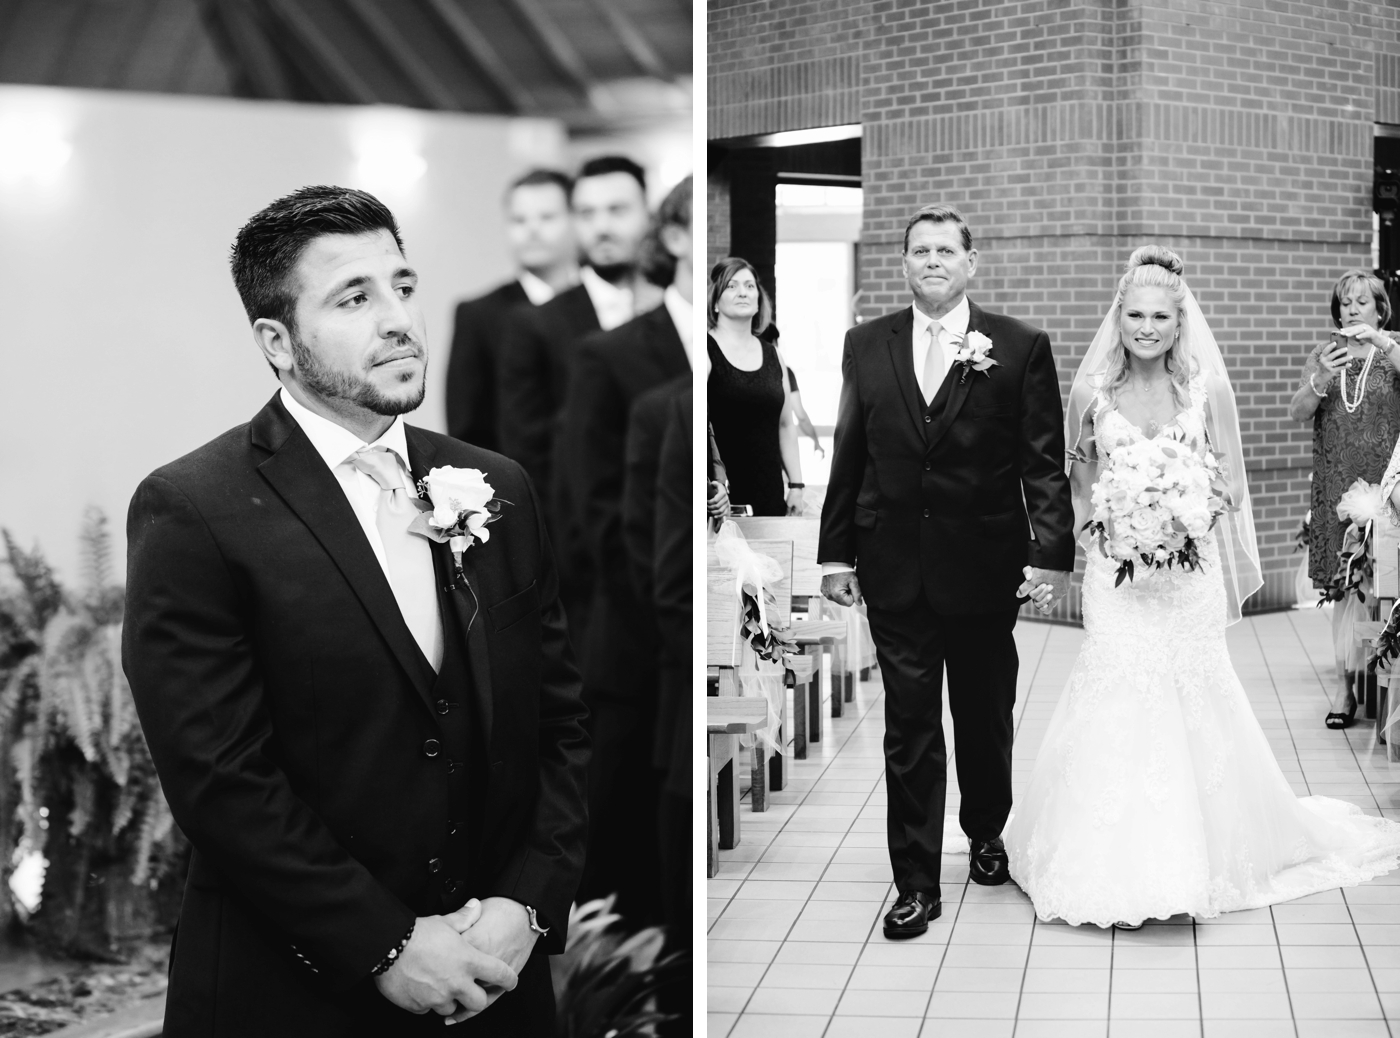 chicago-fine-art-wedding-photography-patano17